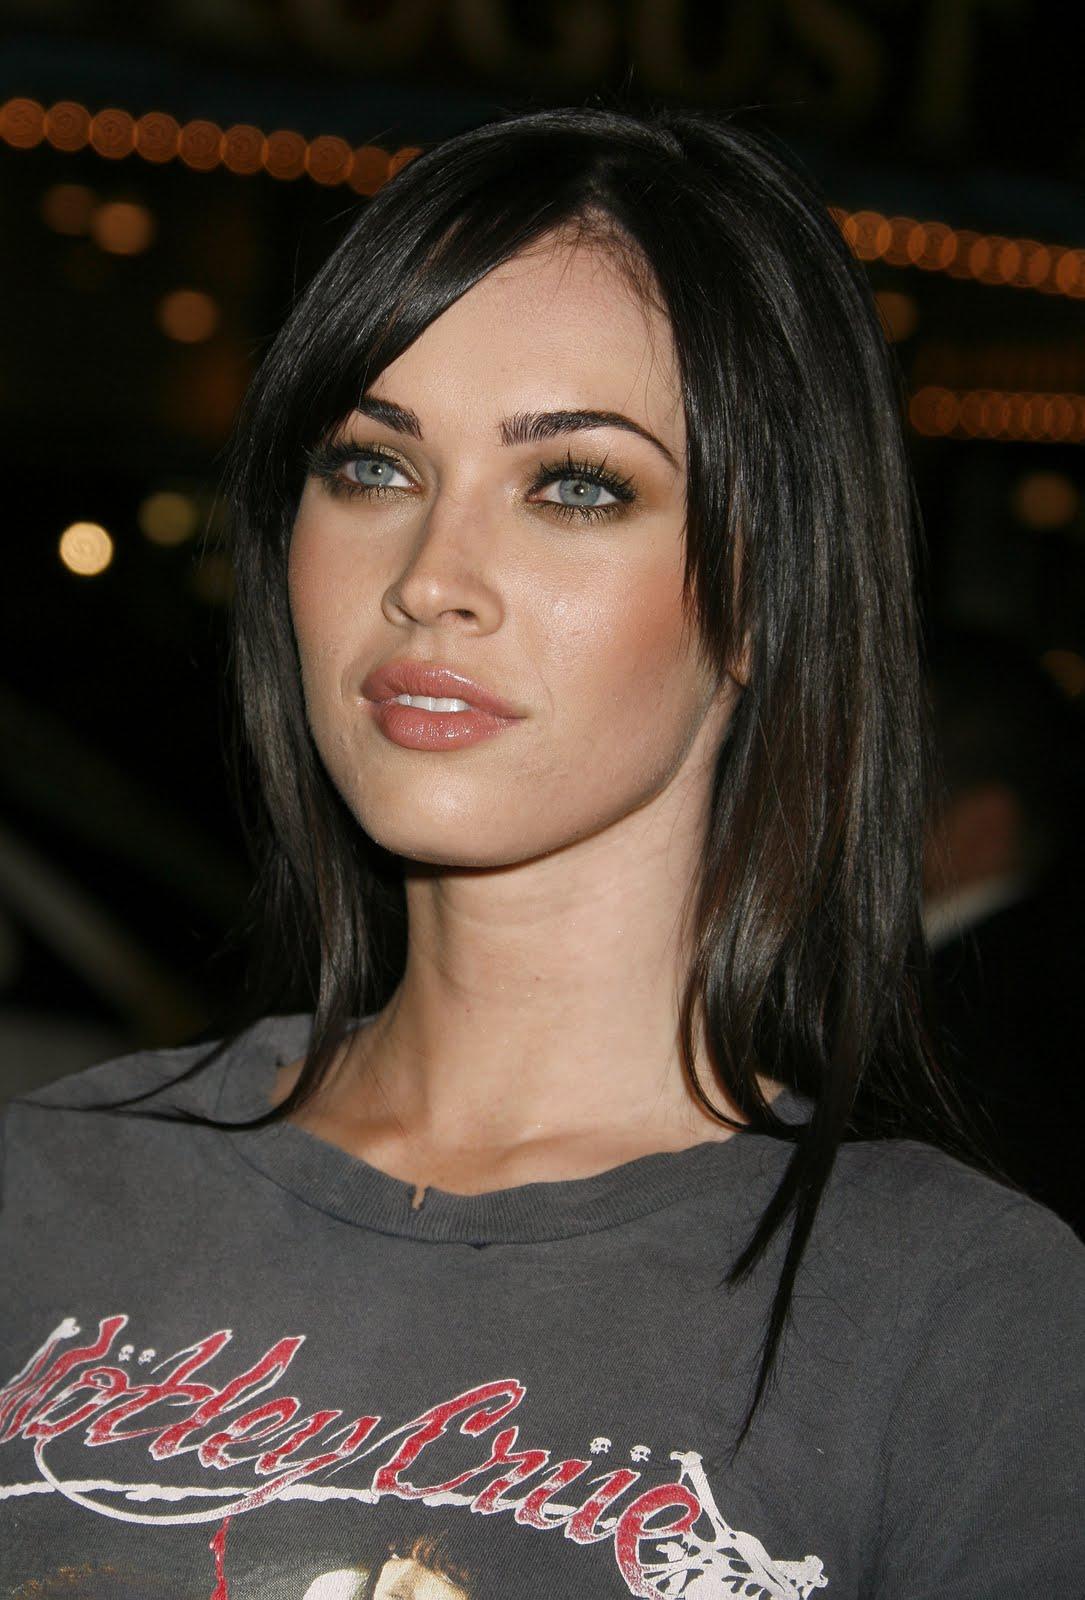 Megan Fox Special Pictures 18 Film Actresses